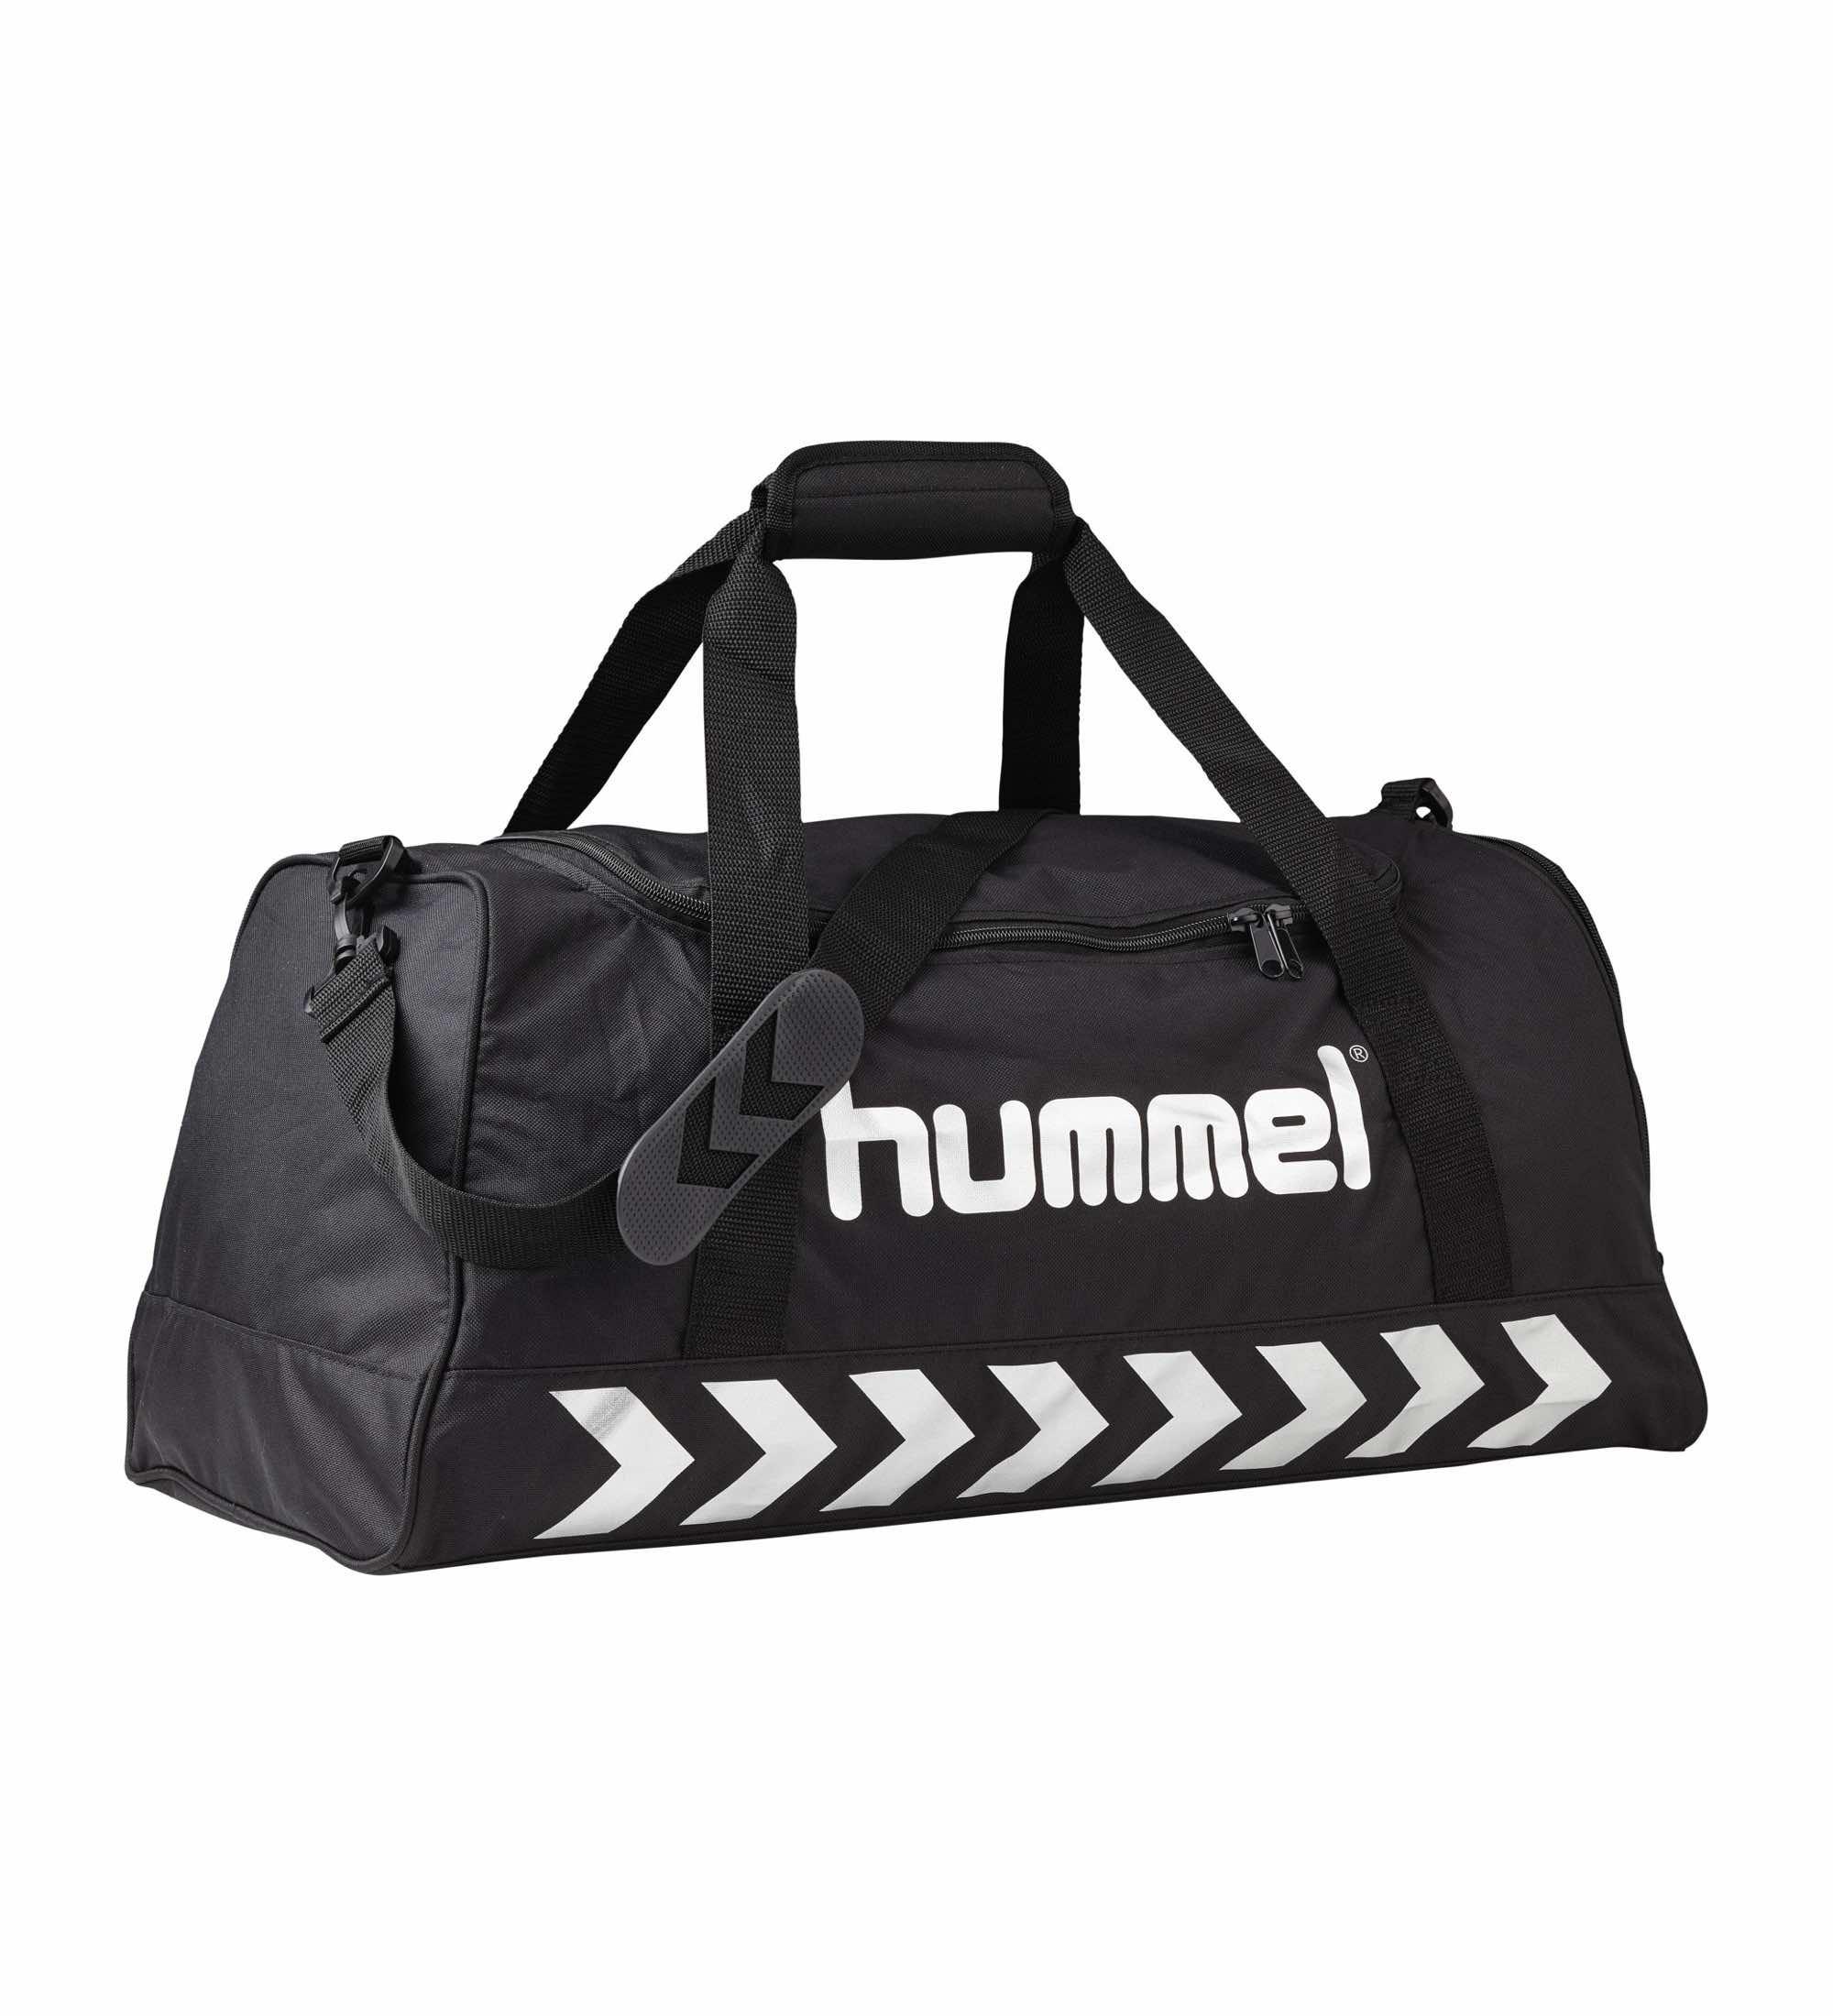 sac sport sport bag authentic hummel myhandball. Black Bedroom Furniture Sets. Home Design Ideas